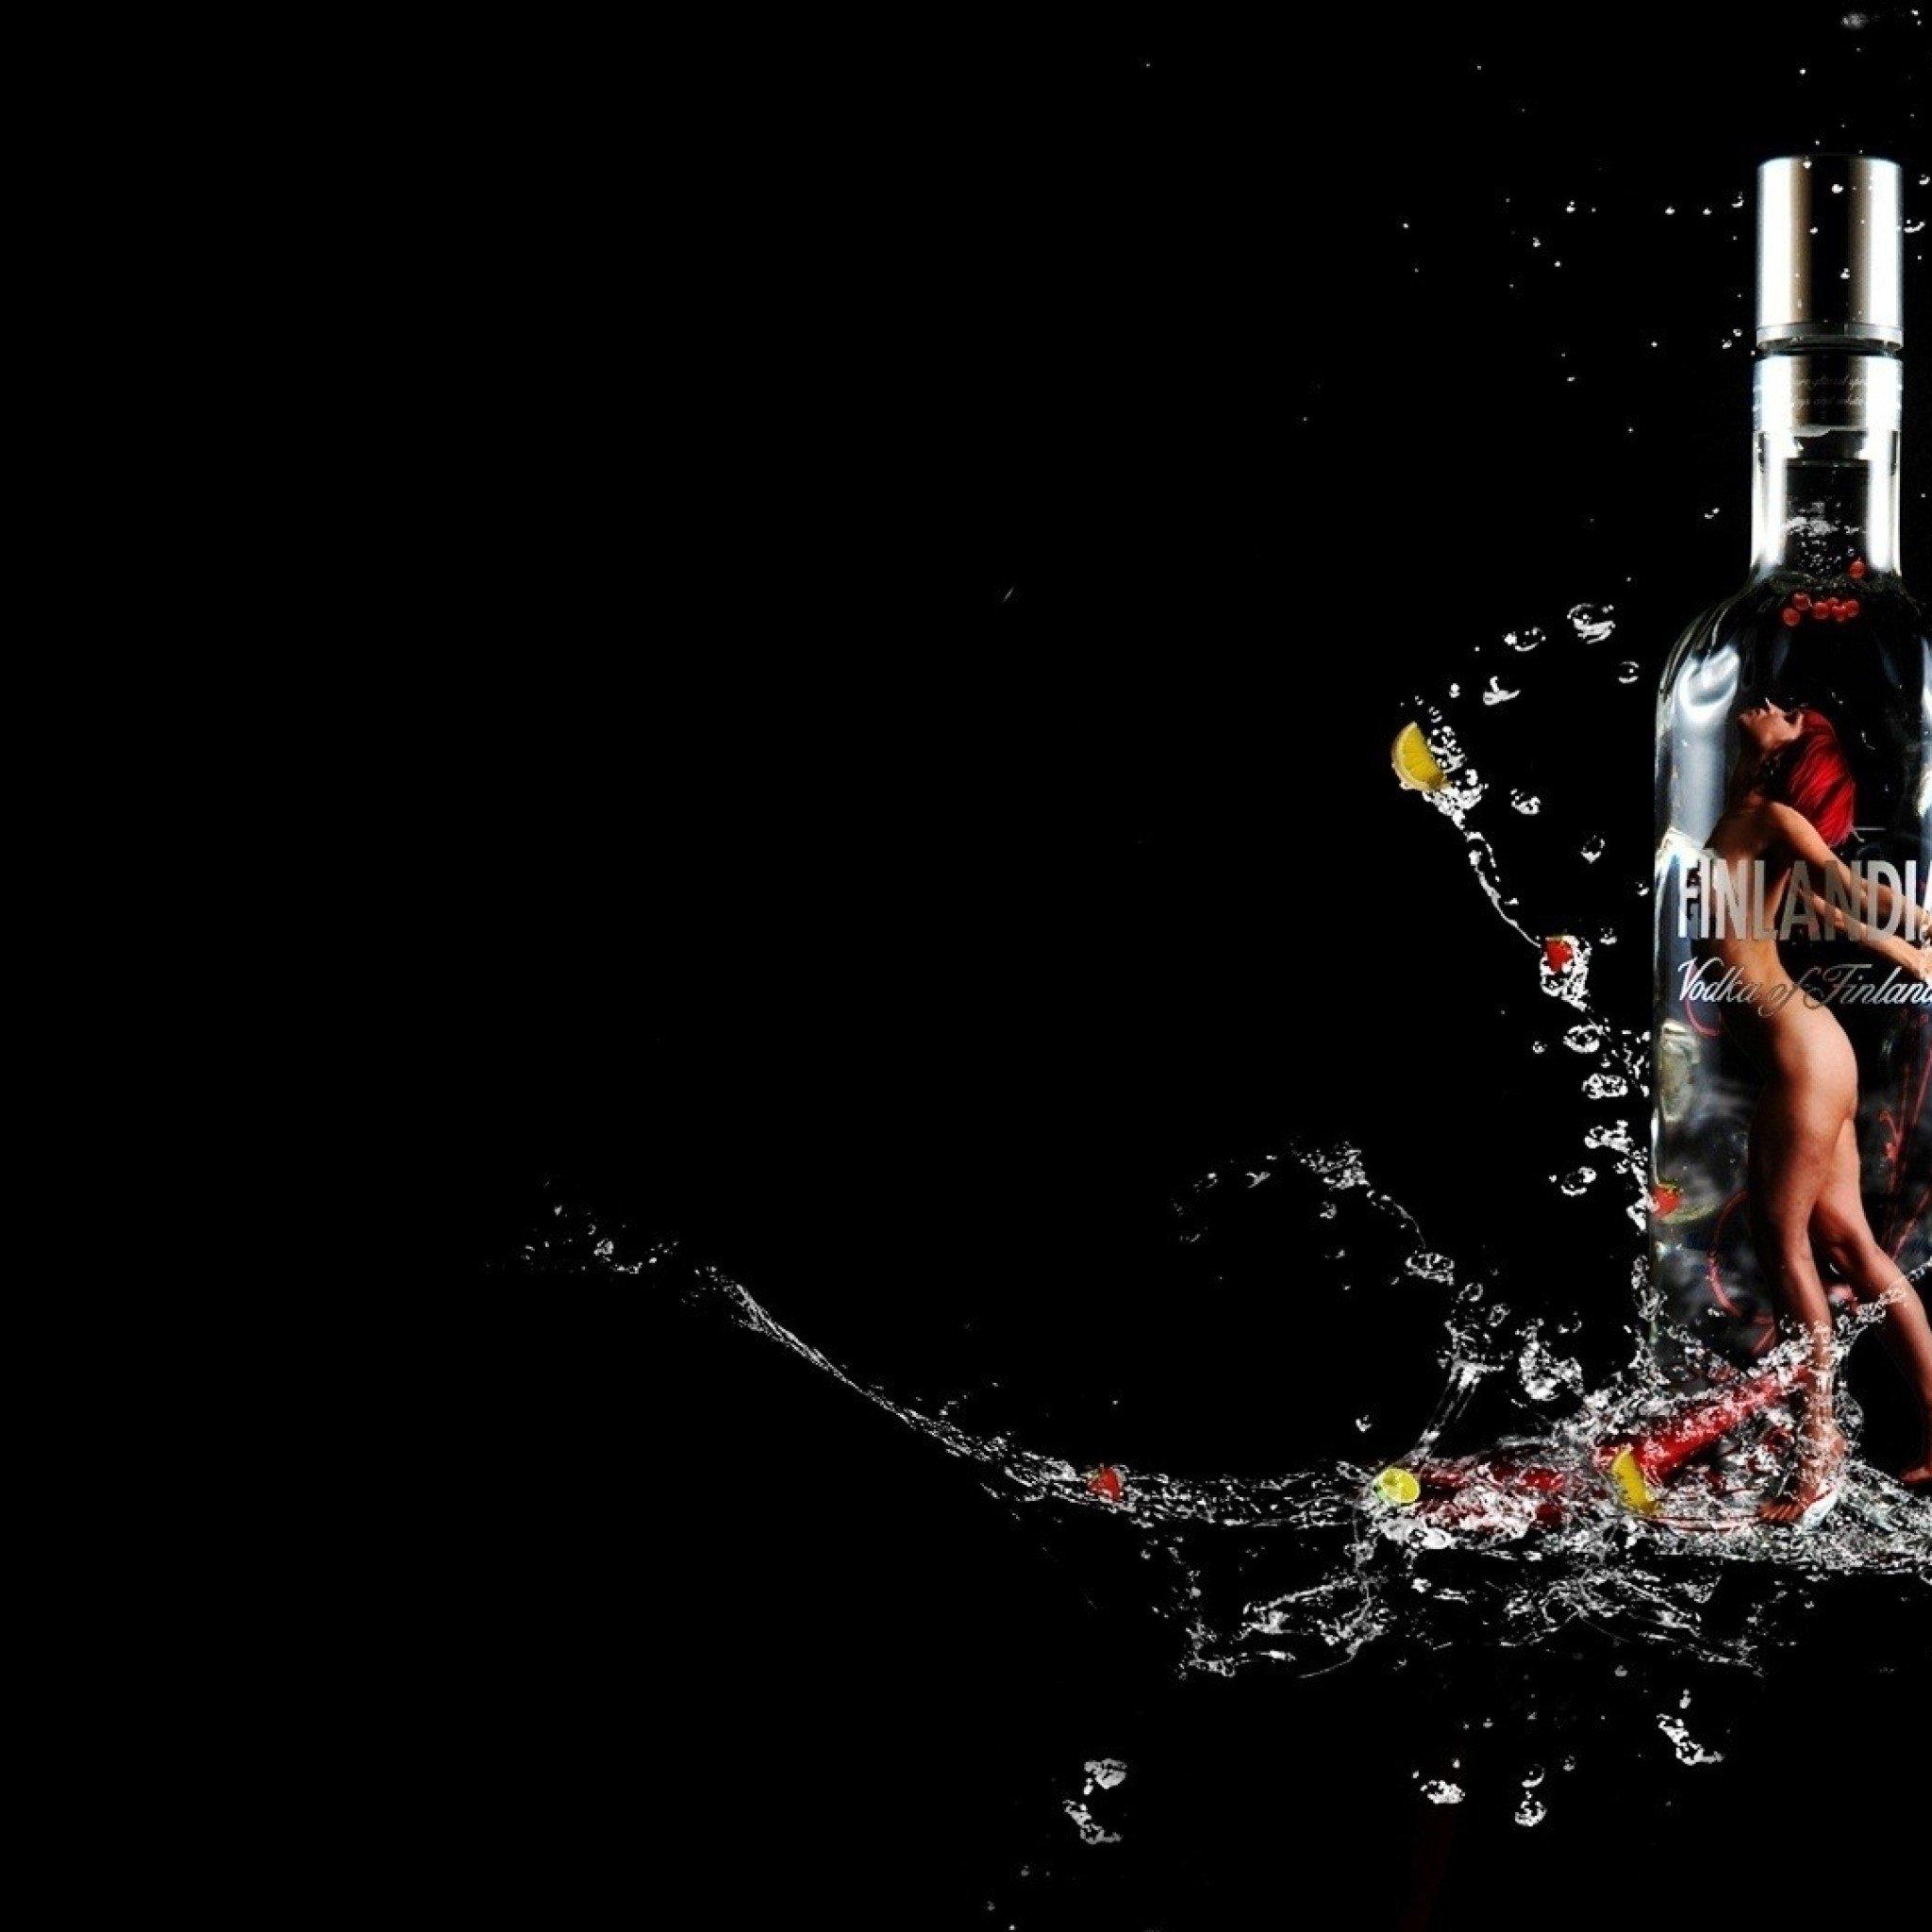 vodkadrinkblackbackground2048x2048 wallpaper